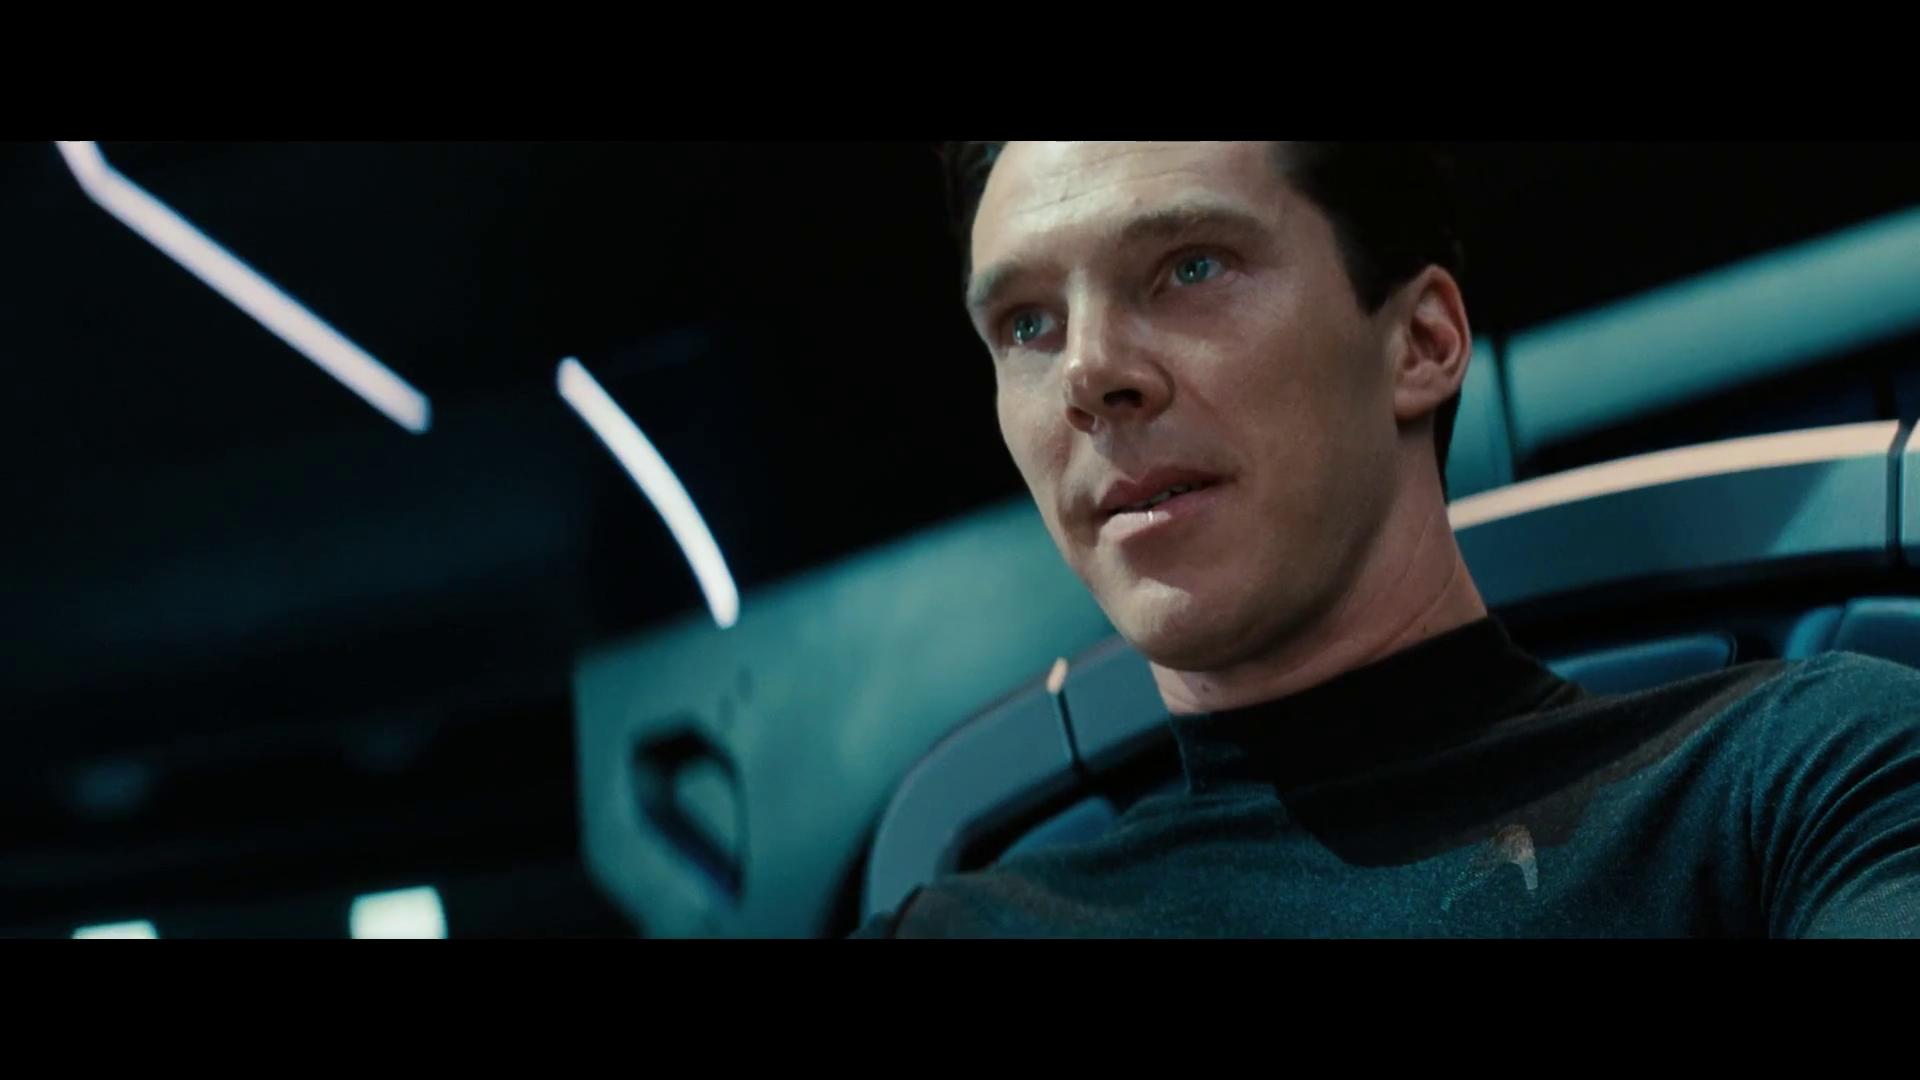 Star Trek Into Darkness Cumberbatch Channeling The Joker Hannibal